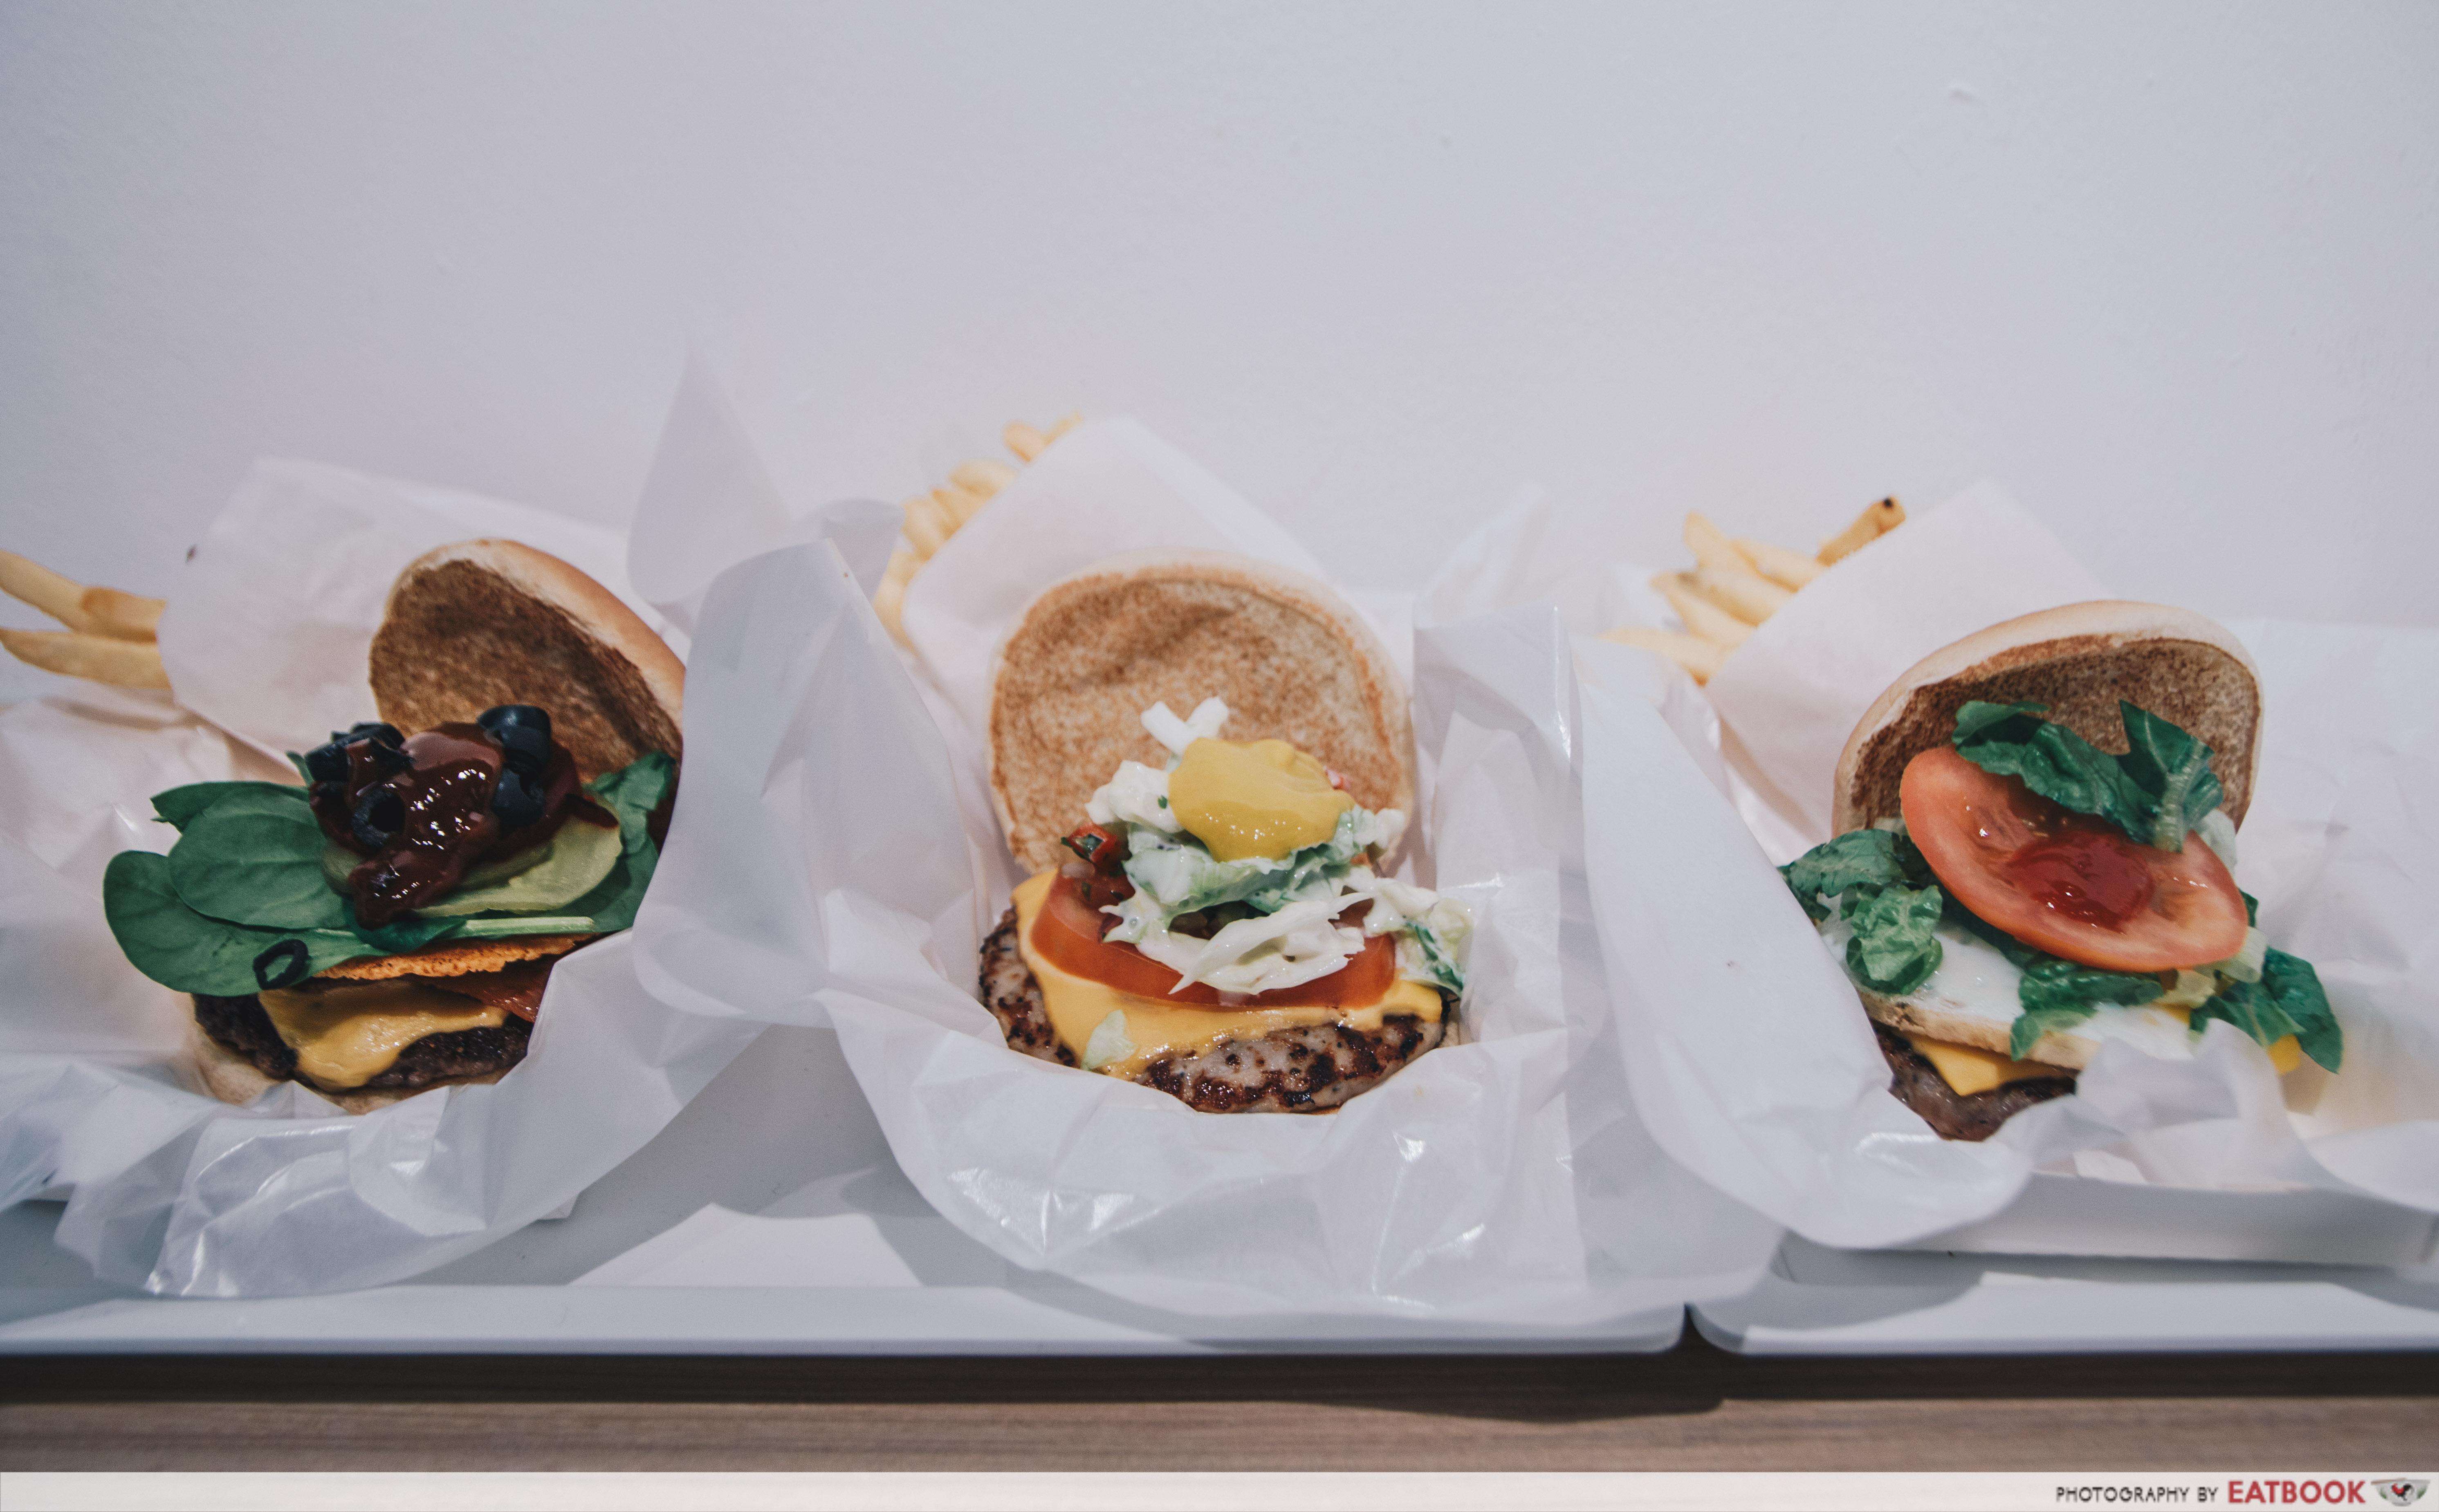 SIMPLEburger Inc. flatlay